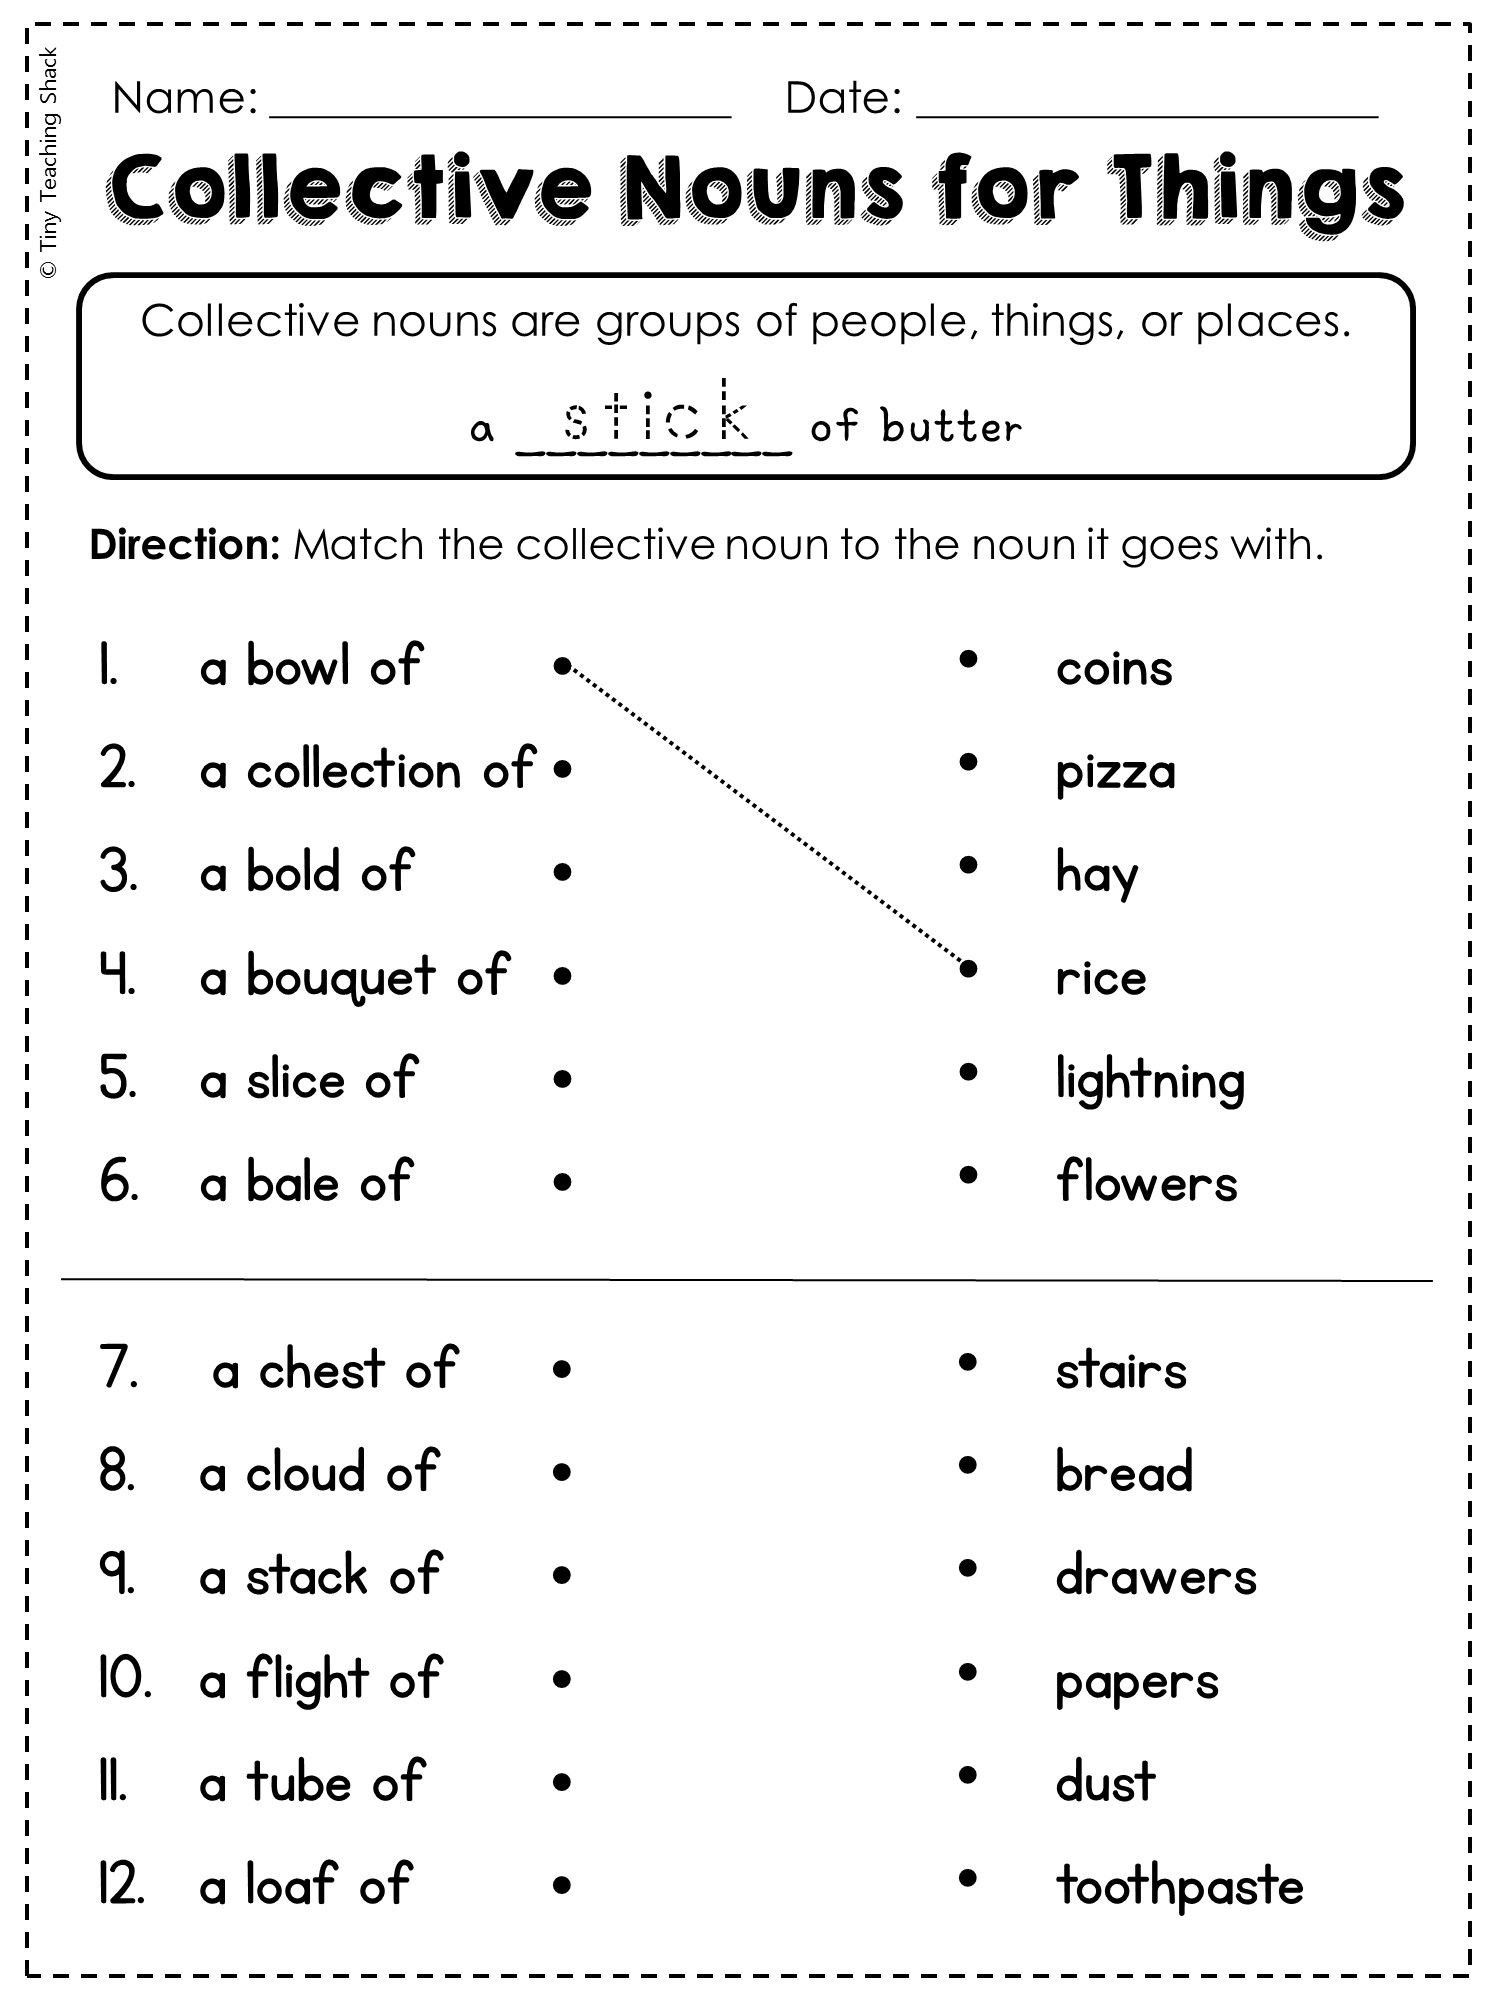 Second Grade Grammar Worksheets 2nd Grade Language Arts and Grammar  Practice Sheets Freebie   Collective nouns worksheet [ 2000 x 1500 Pixel ]